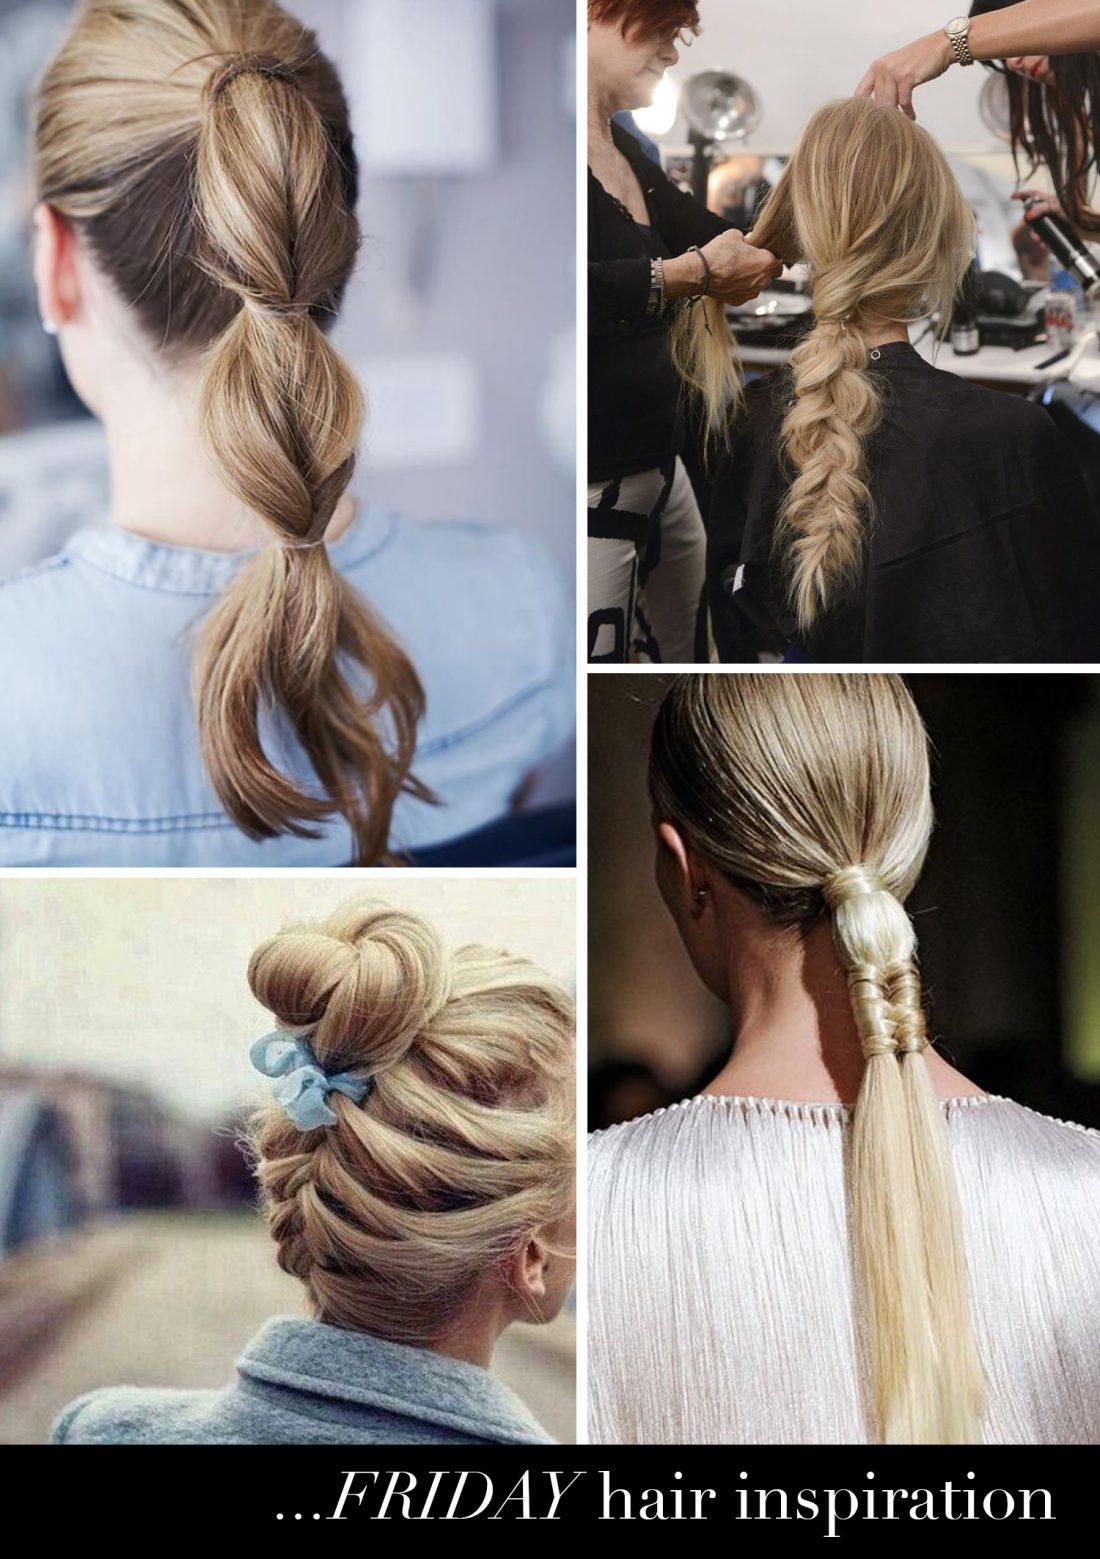 hair-inspiration@2x.jpg